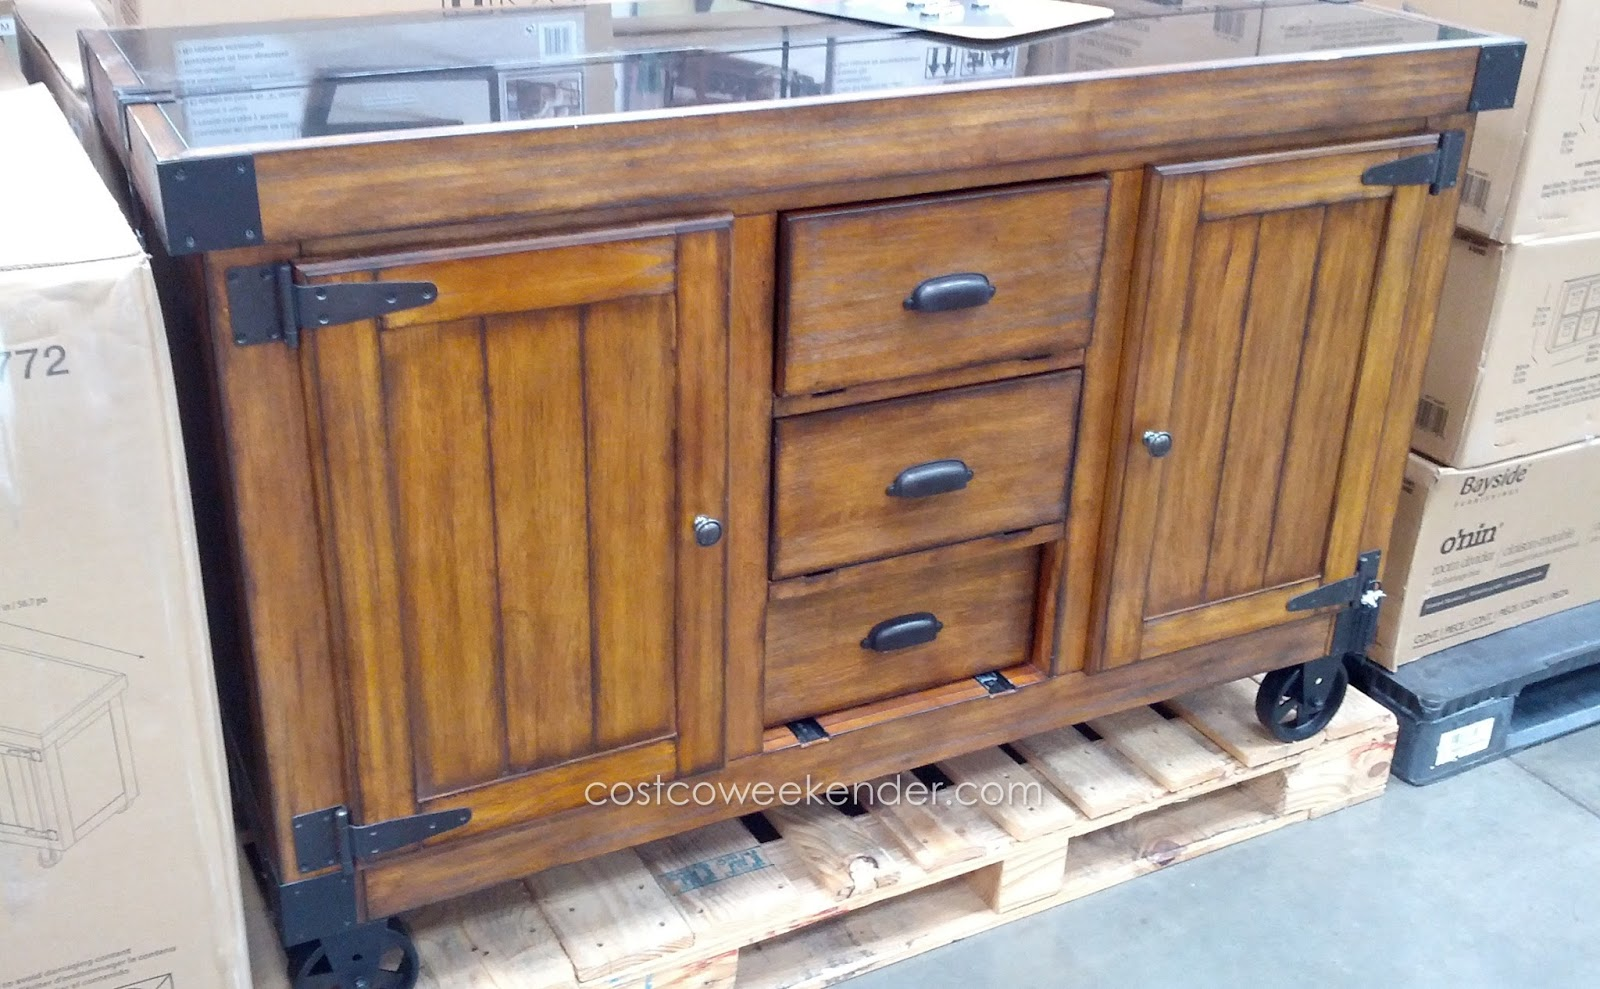 Regal Living Whitman Kitchen Cart Costco Weekender